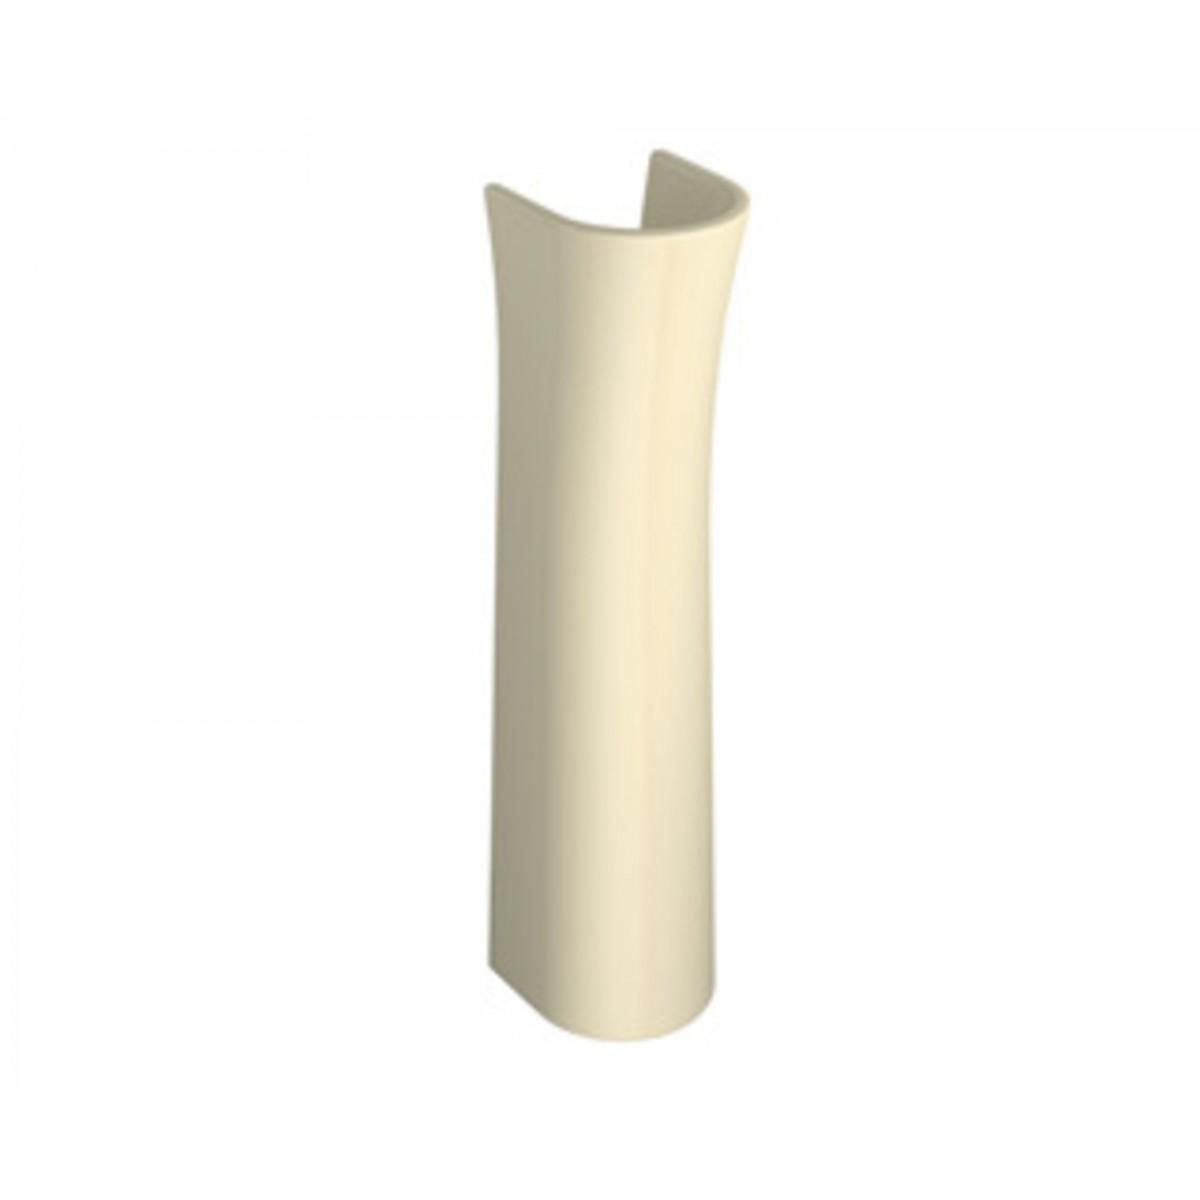 Coluna Convencional Universal Deca Creme Ref. C.1.37